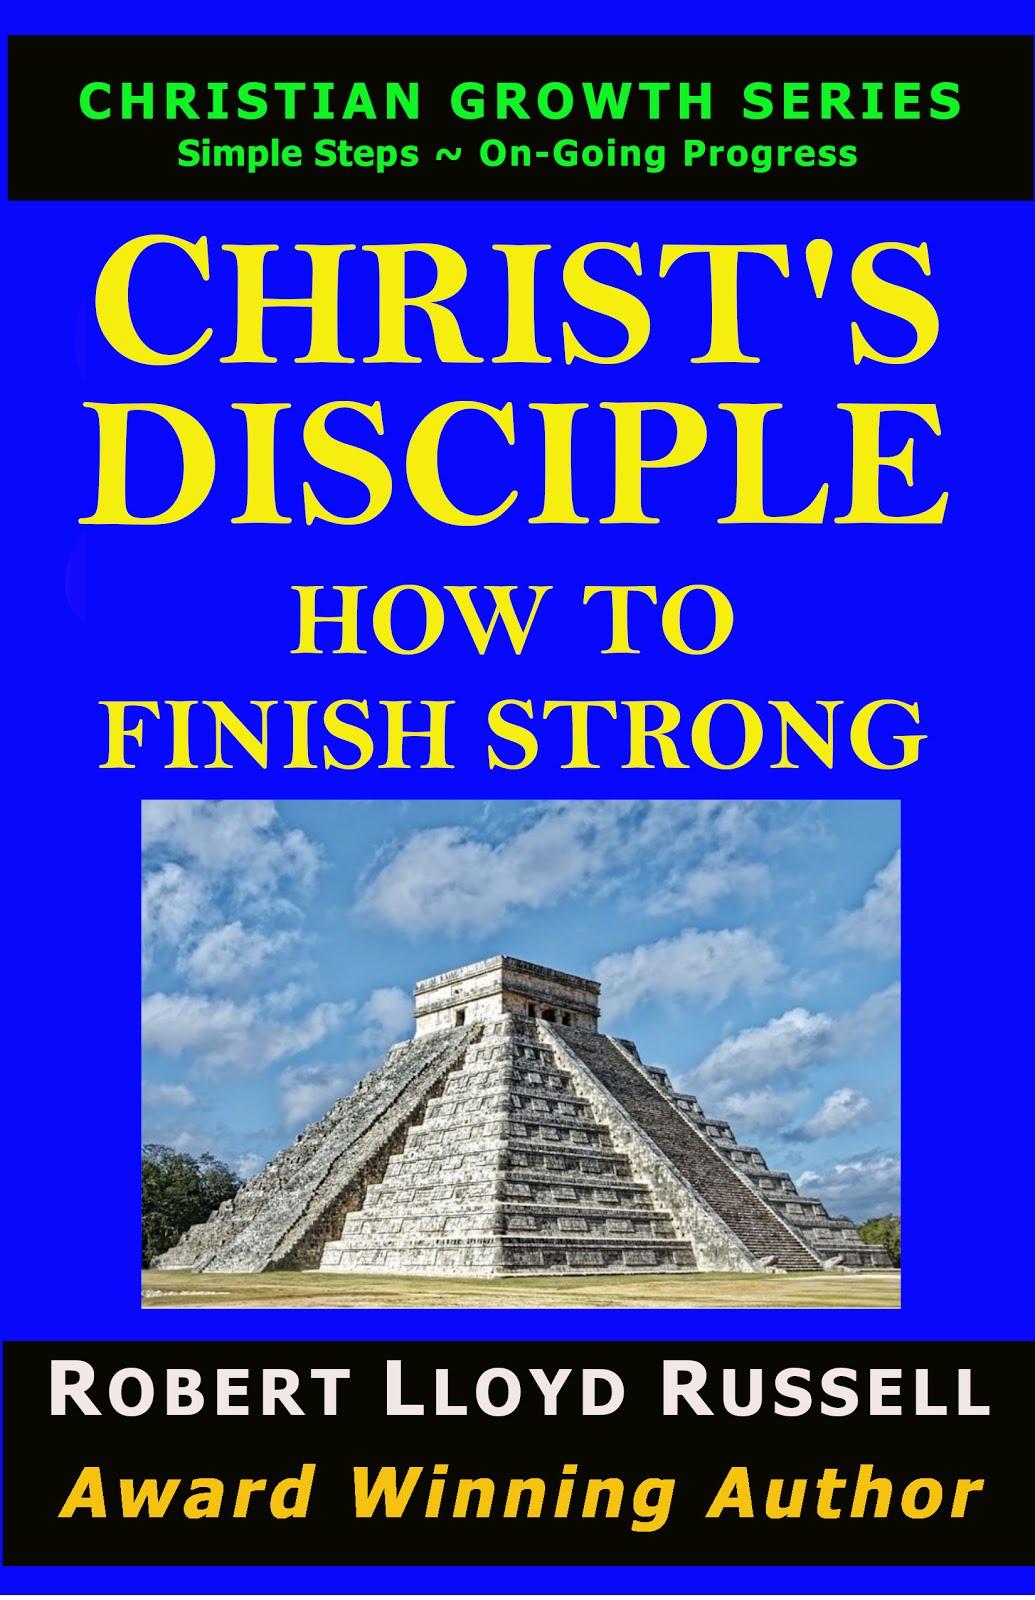 Christ's Disciple